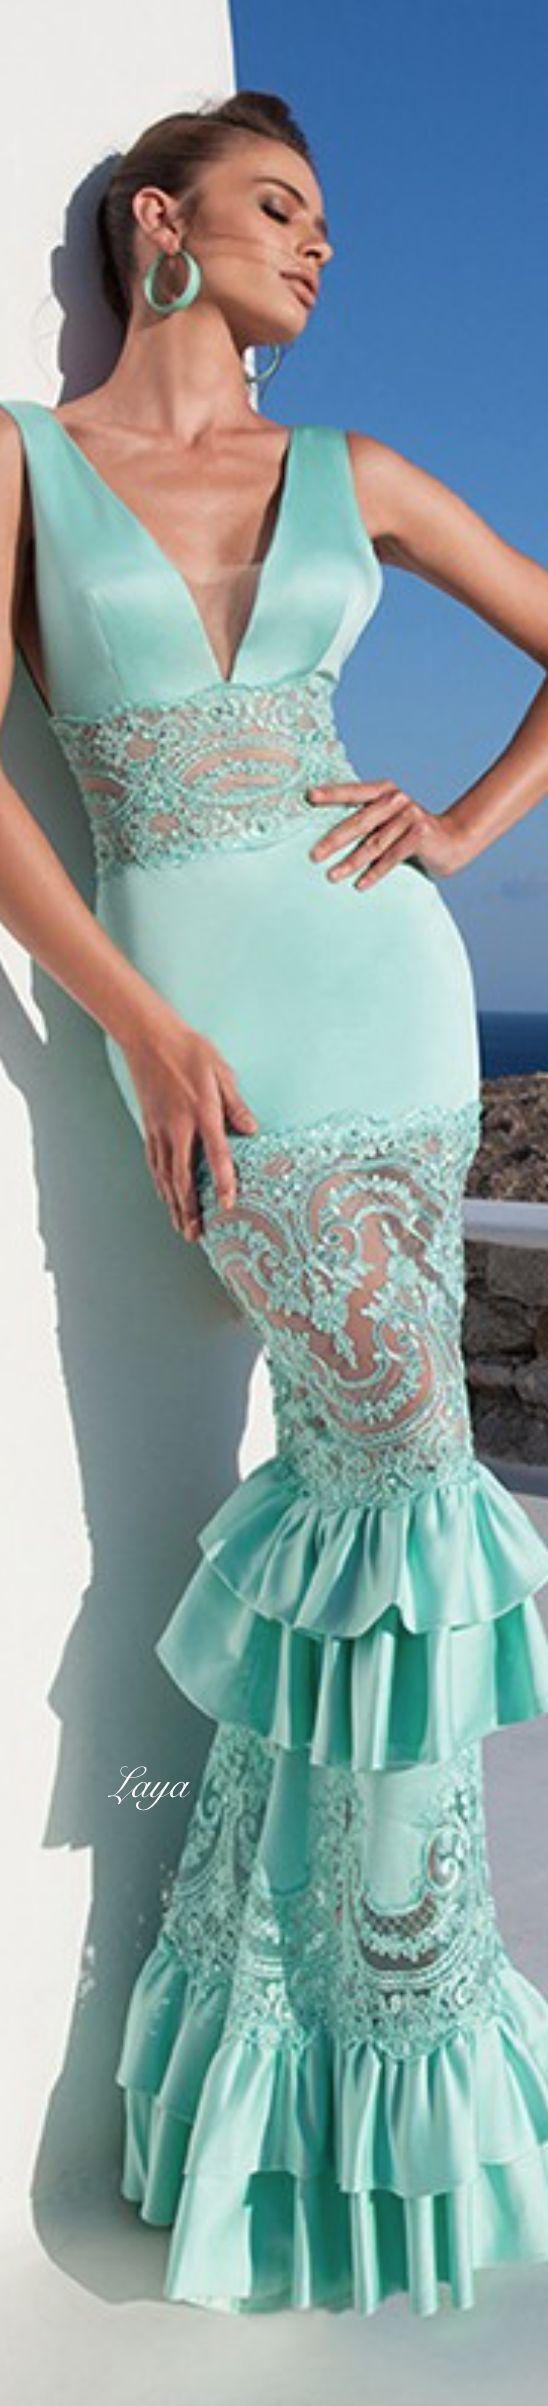 Mariage - ■ Aqua - Turquoise